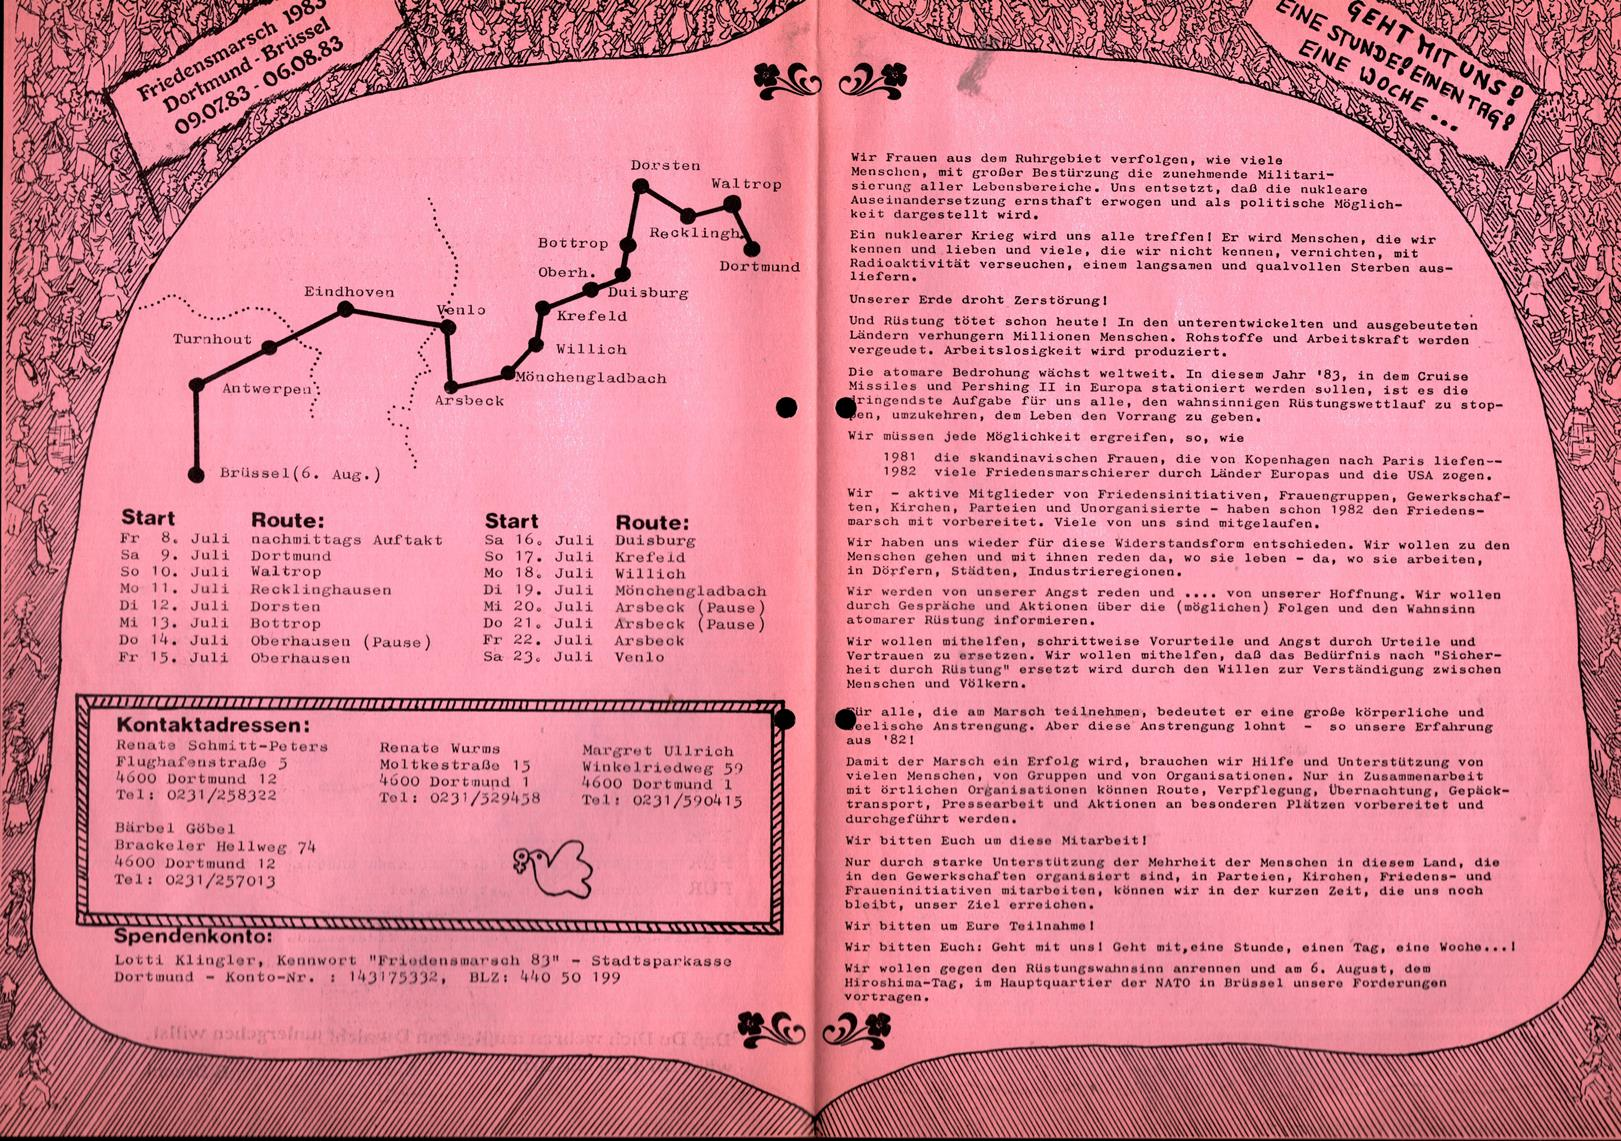 Dortmund_Friedensbewegung_19830700_004